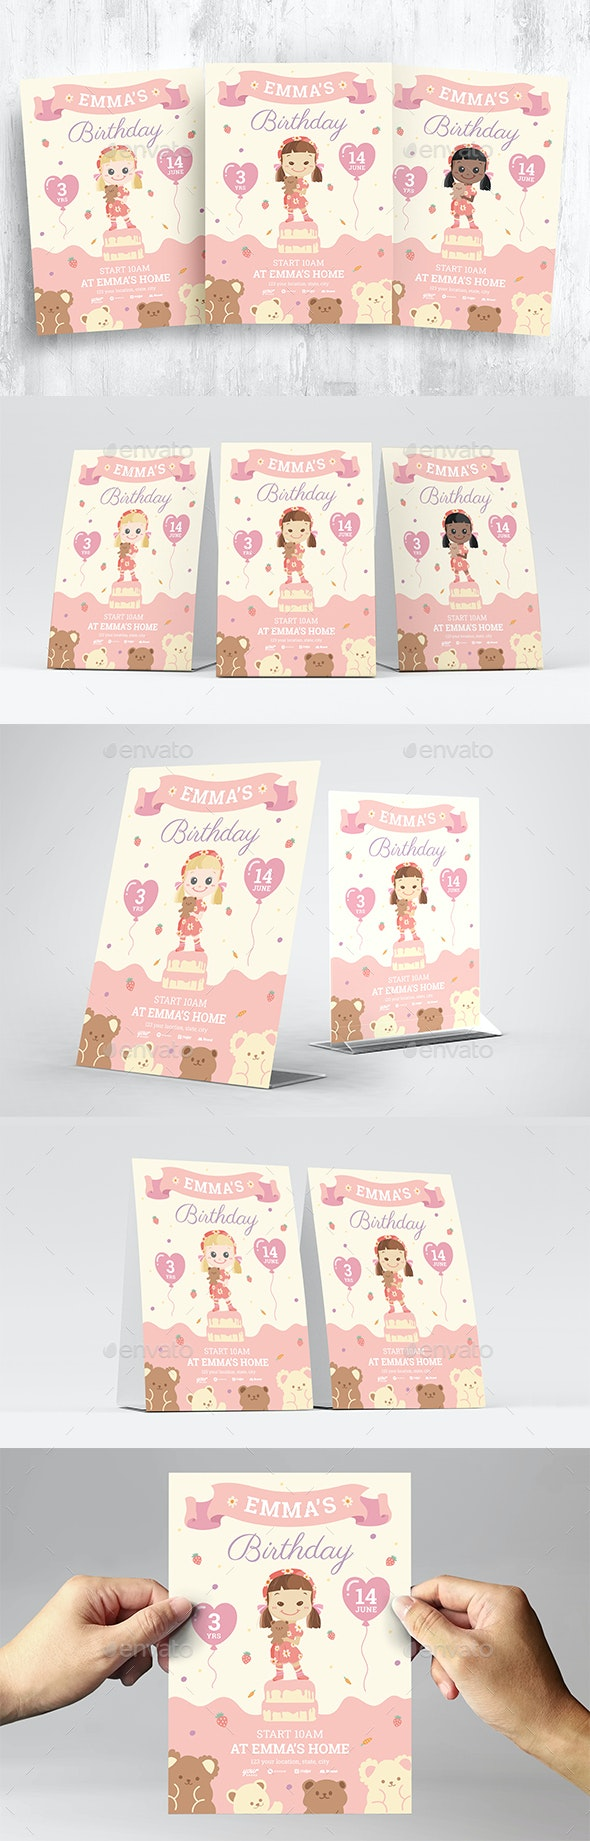 Girls Birthday Invitation Flyer - Flyers Print Templates